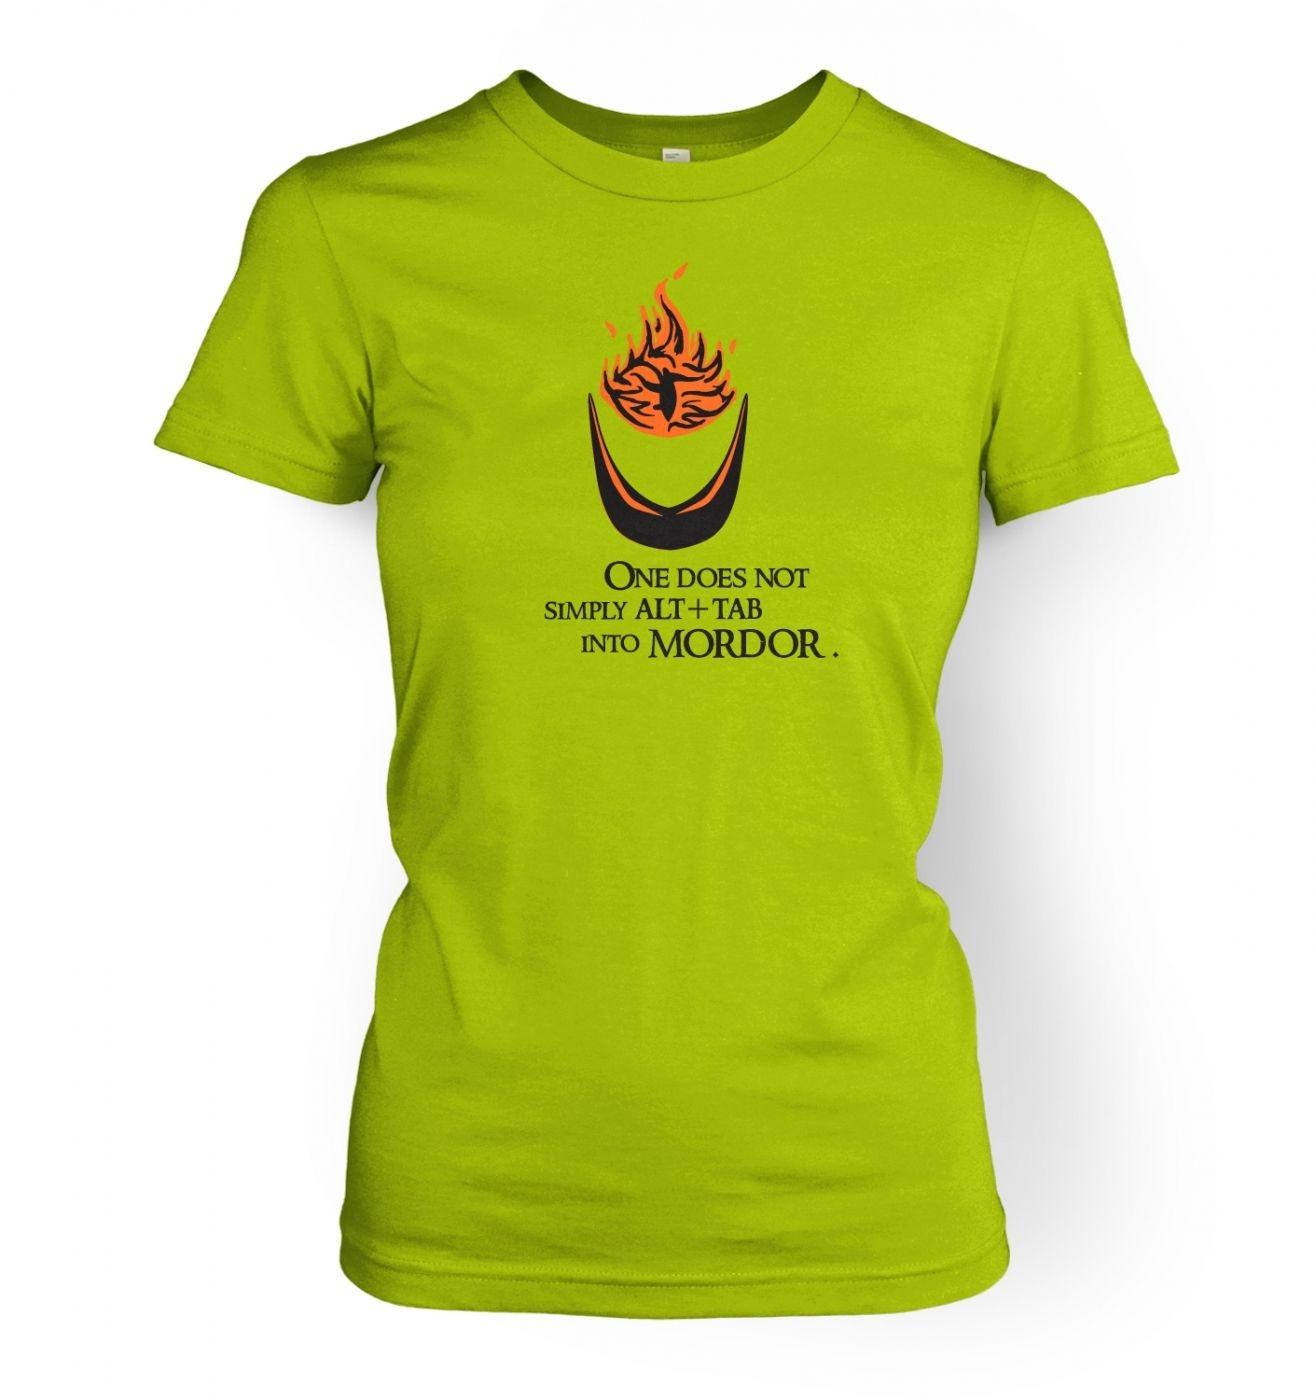 Women's Alt+tab into Mordor t-shirt